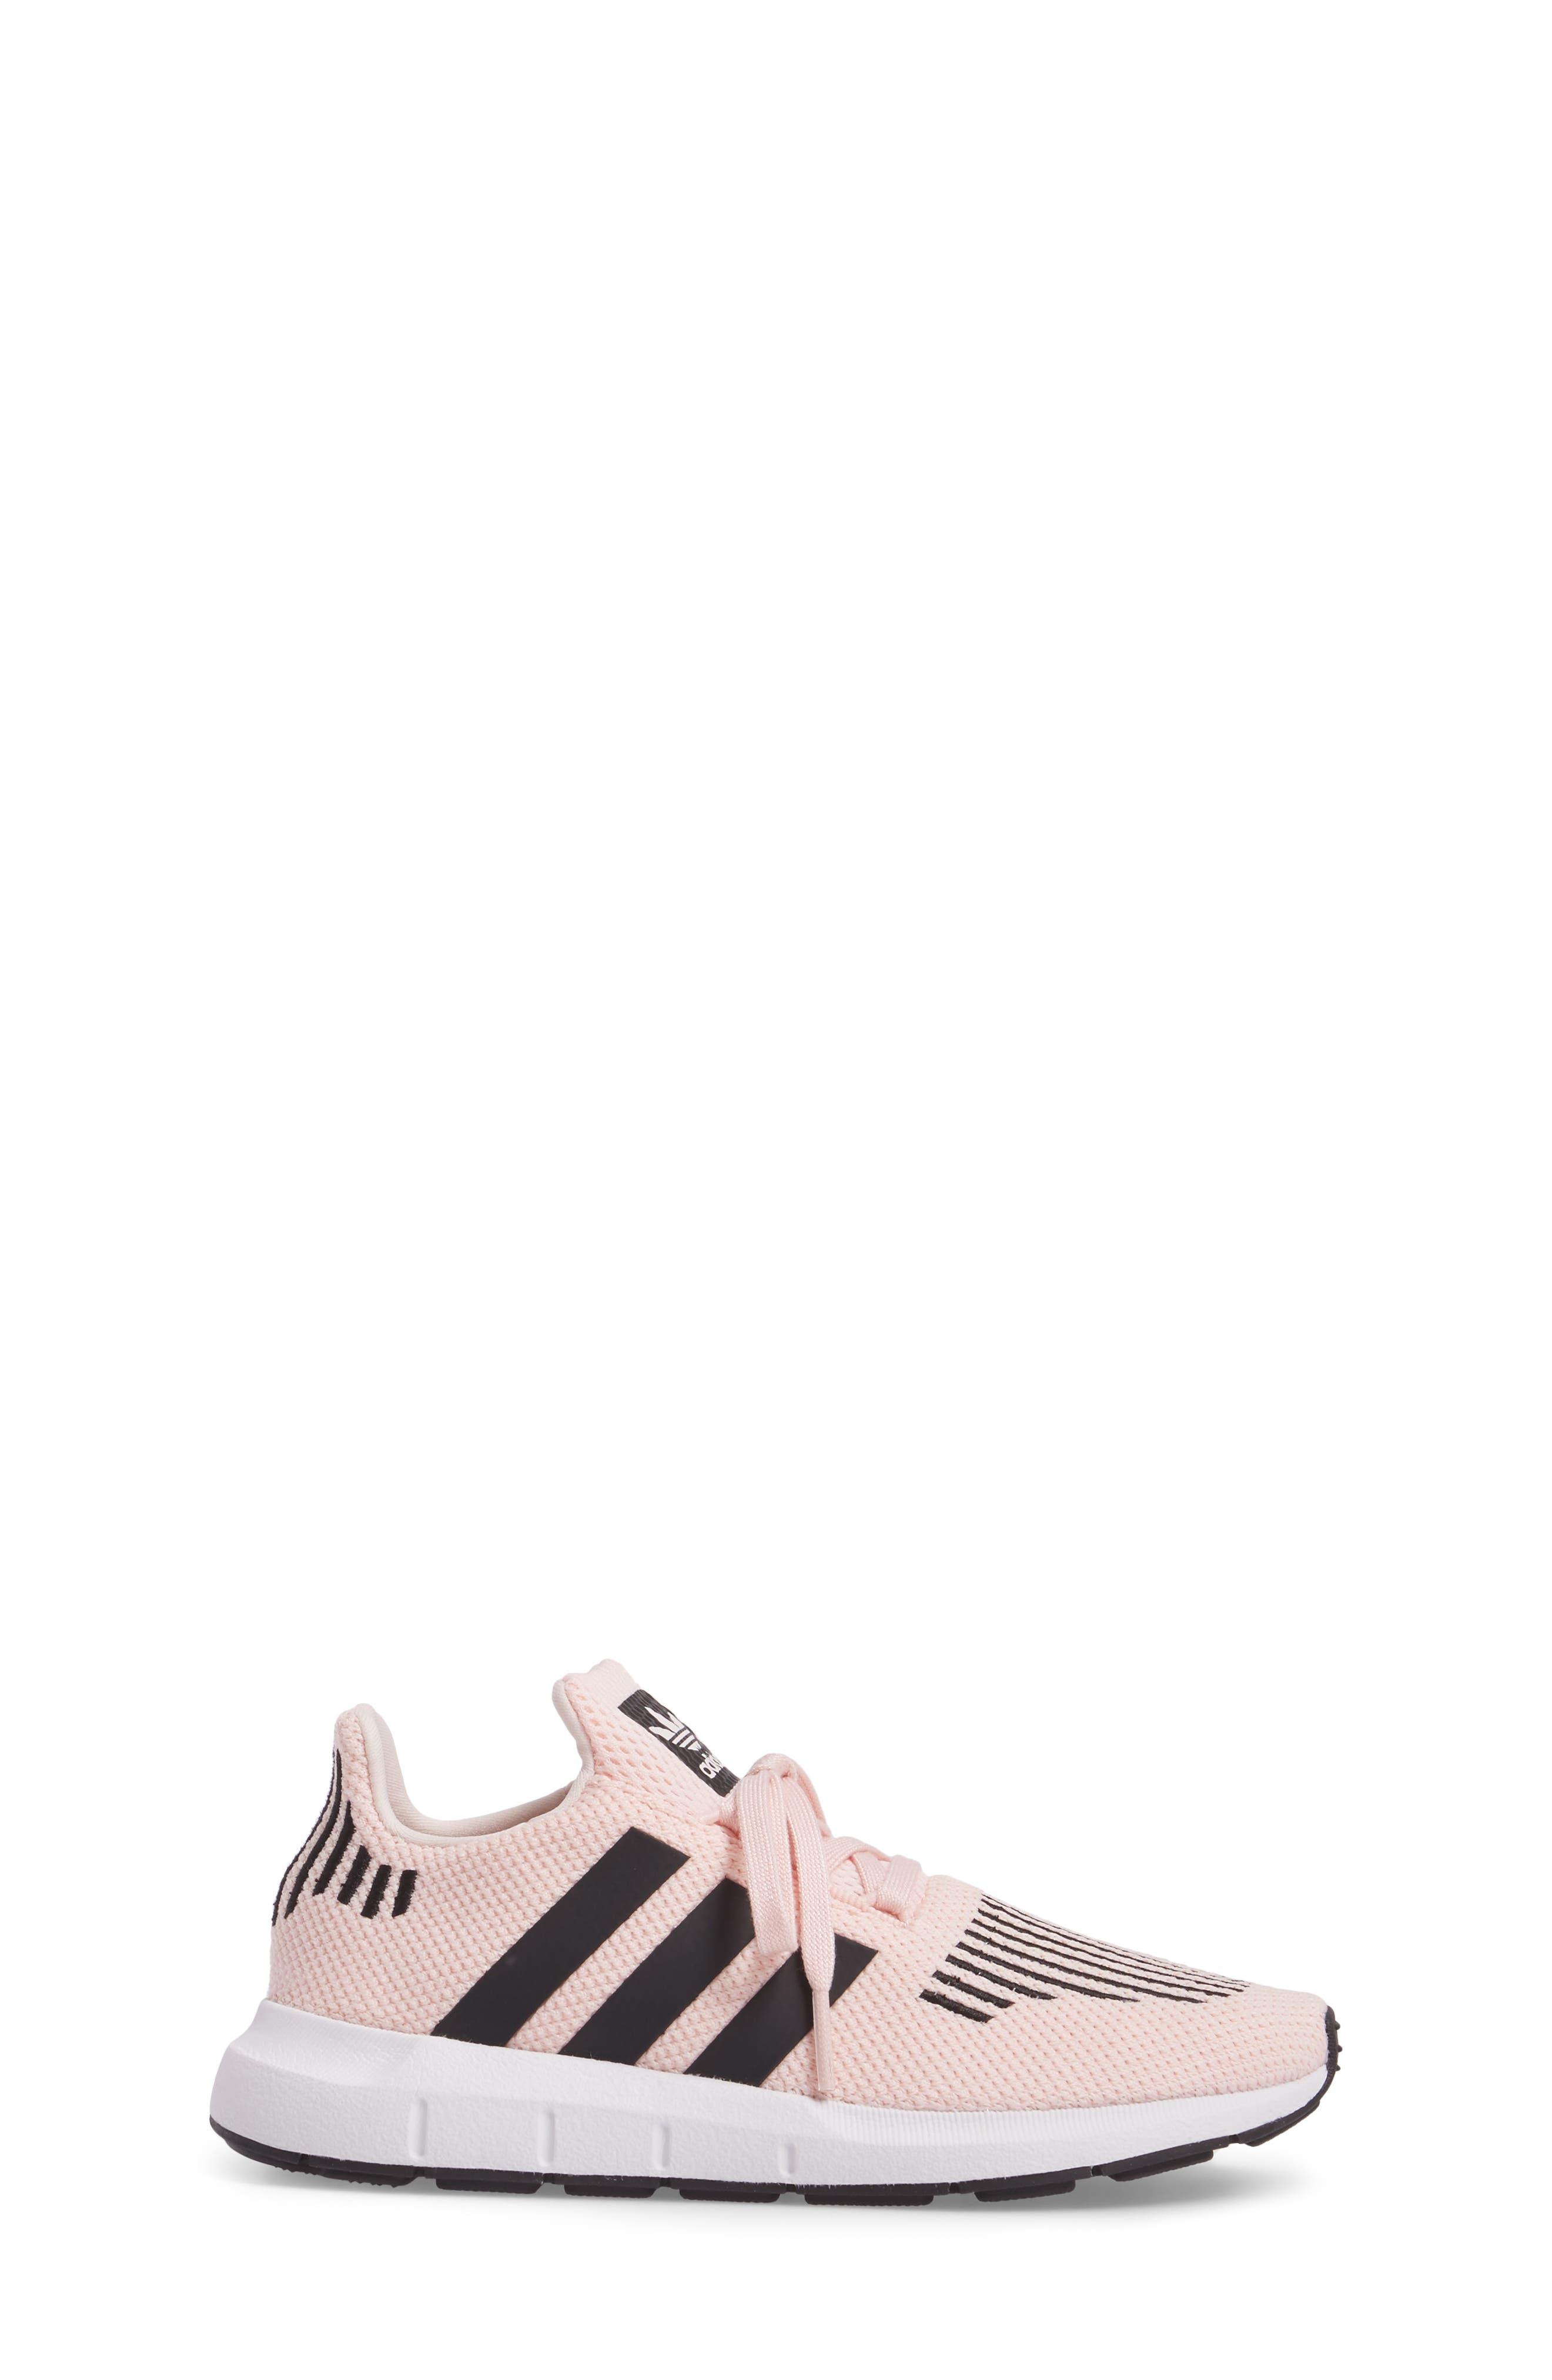 Swift Run C Sneaker,                             Alternate thumbnail 3, color,                             Icey Pink/ Core Black